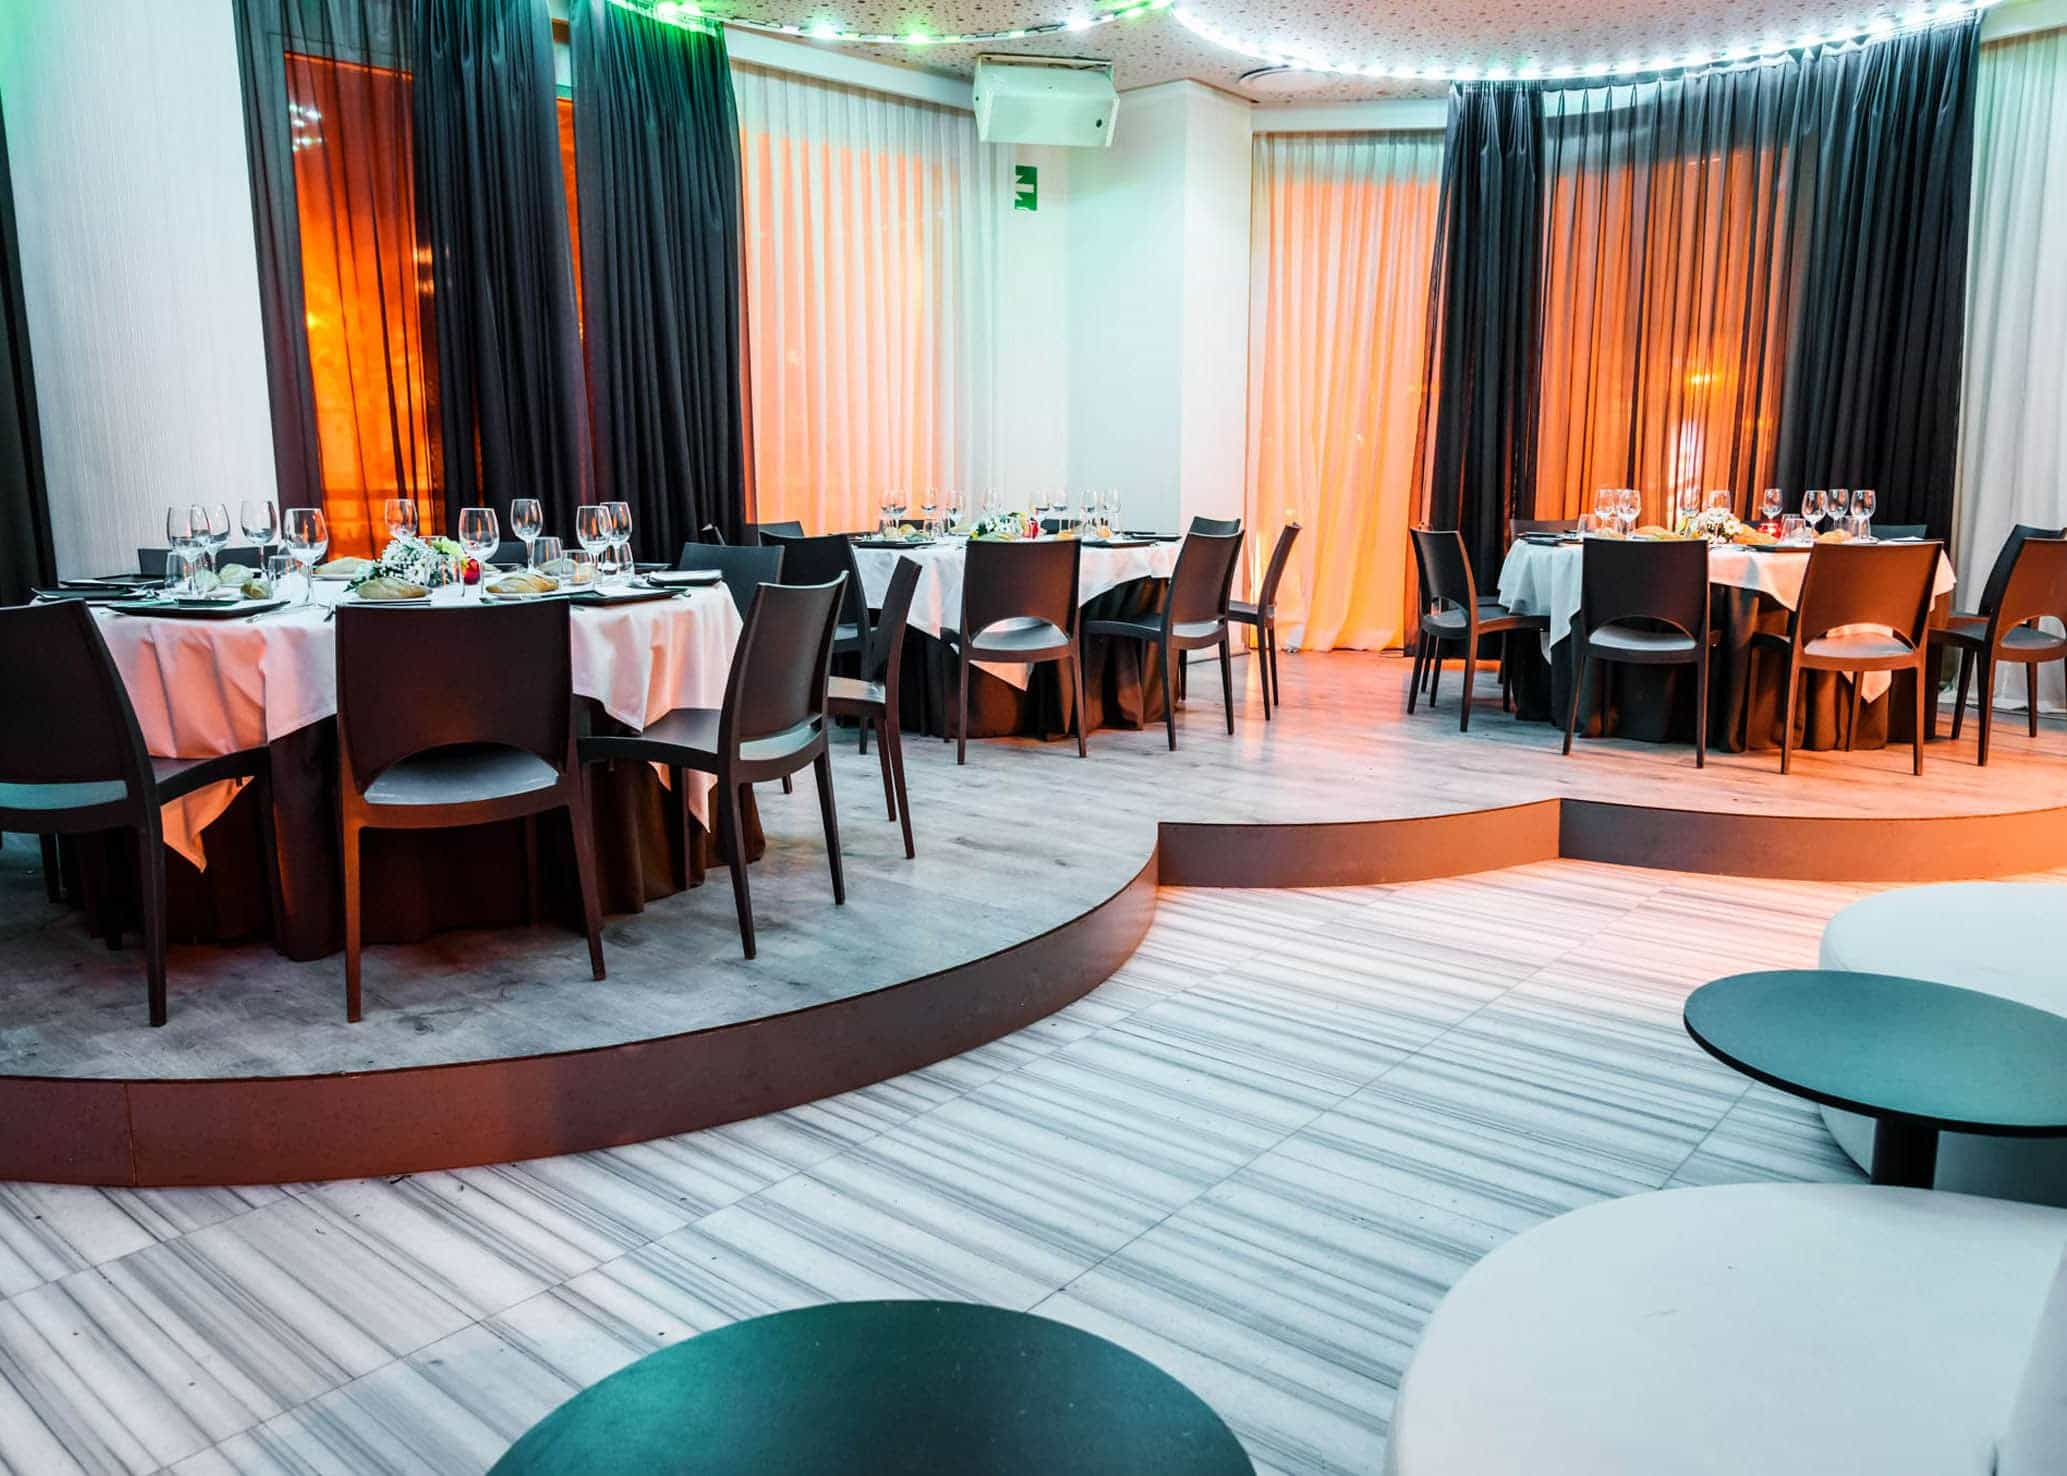 Restaurante zona Palacio de Congresos imagen 3